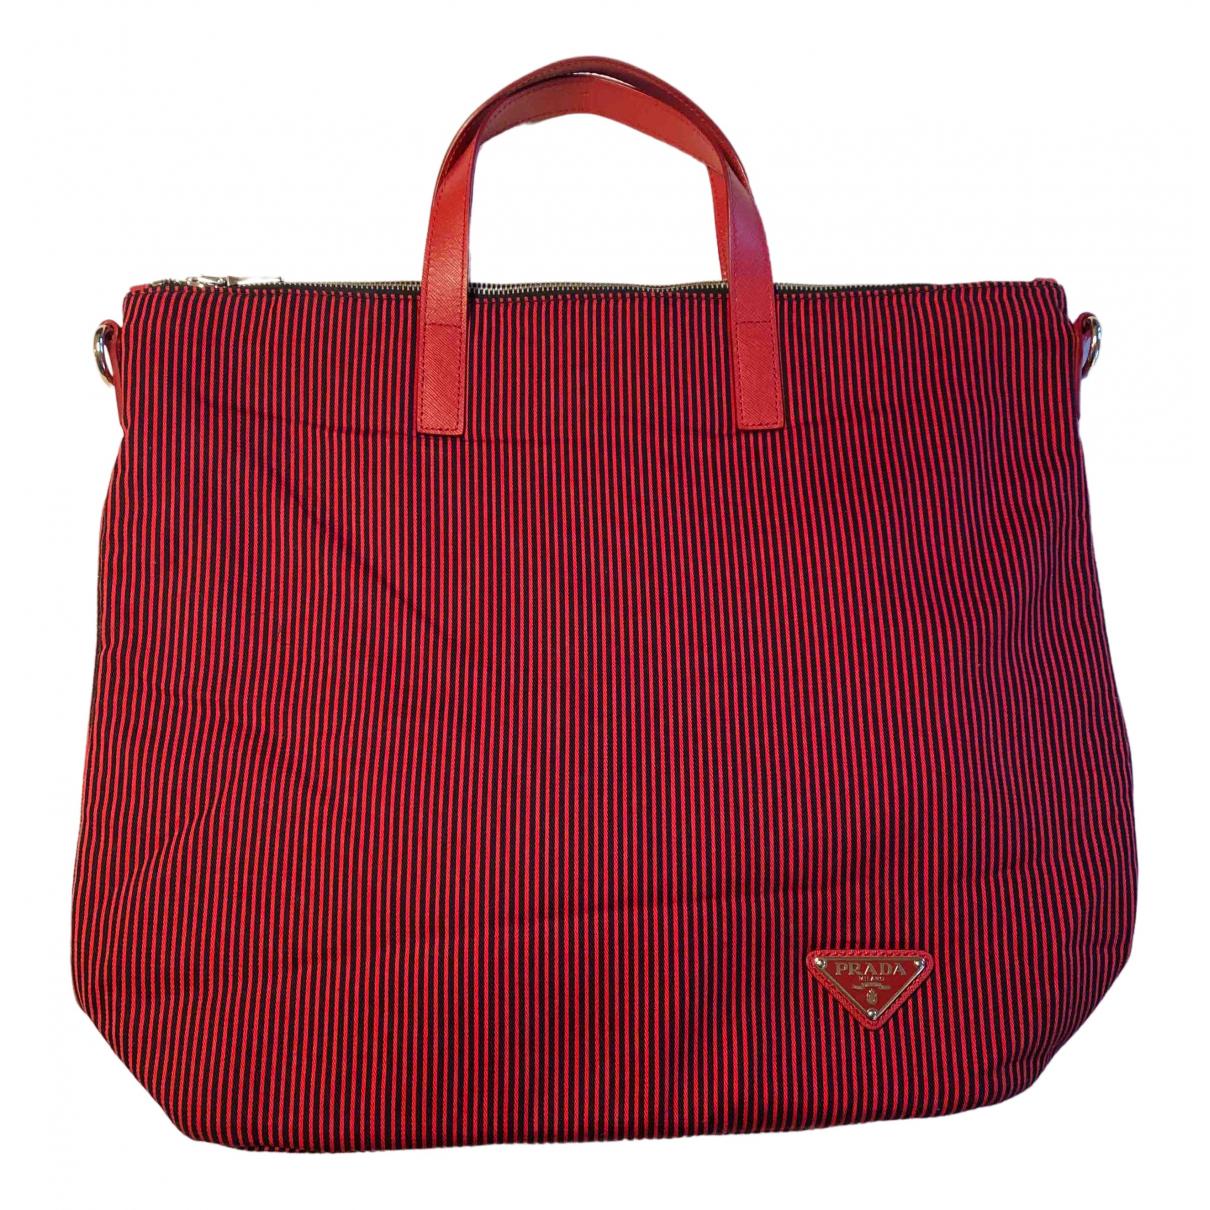 Prada N Red Cloth handbag for Women N